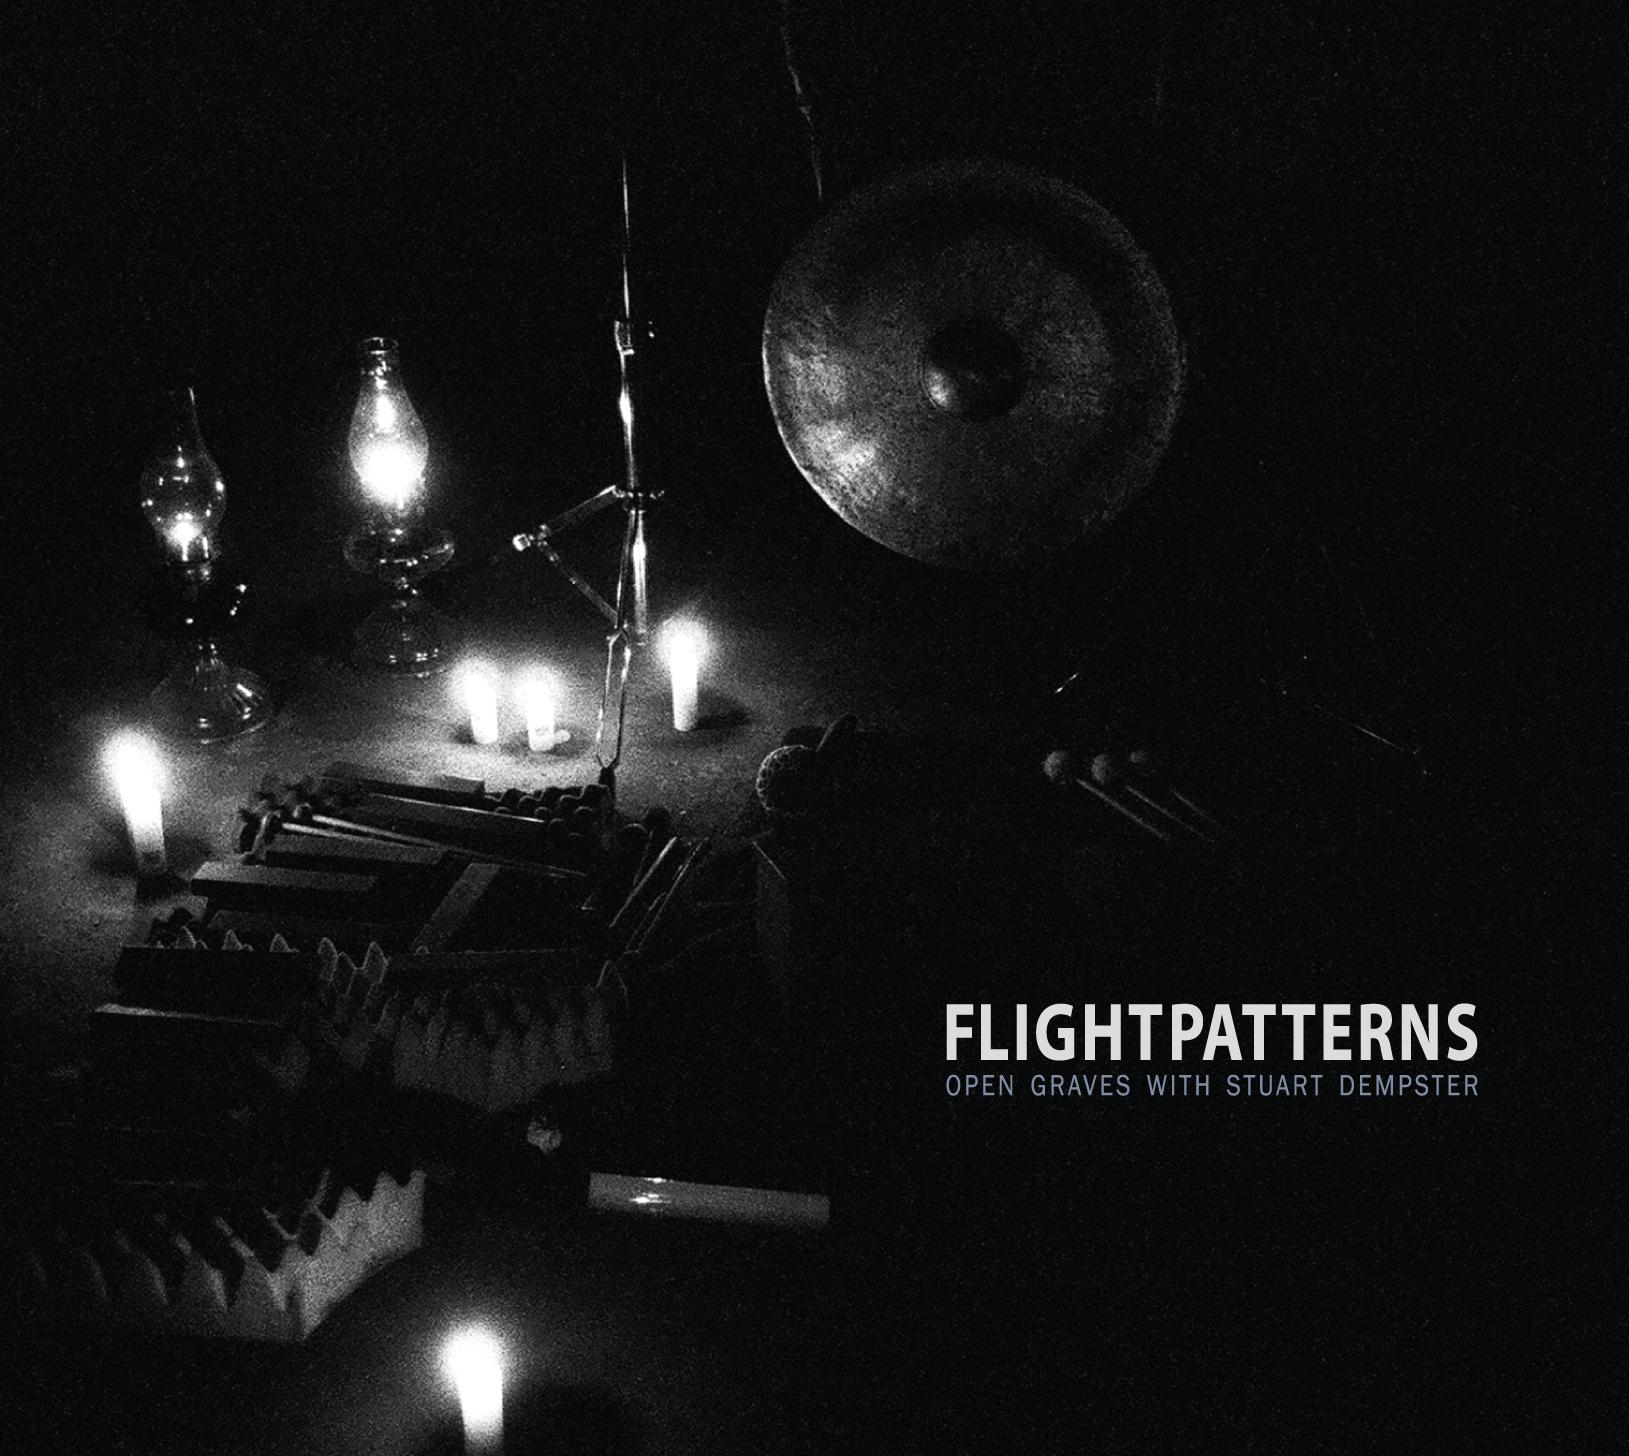 flightpatterns.png